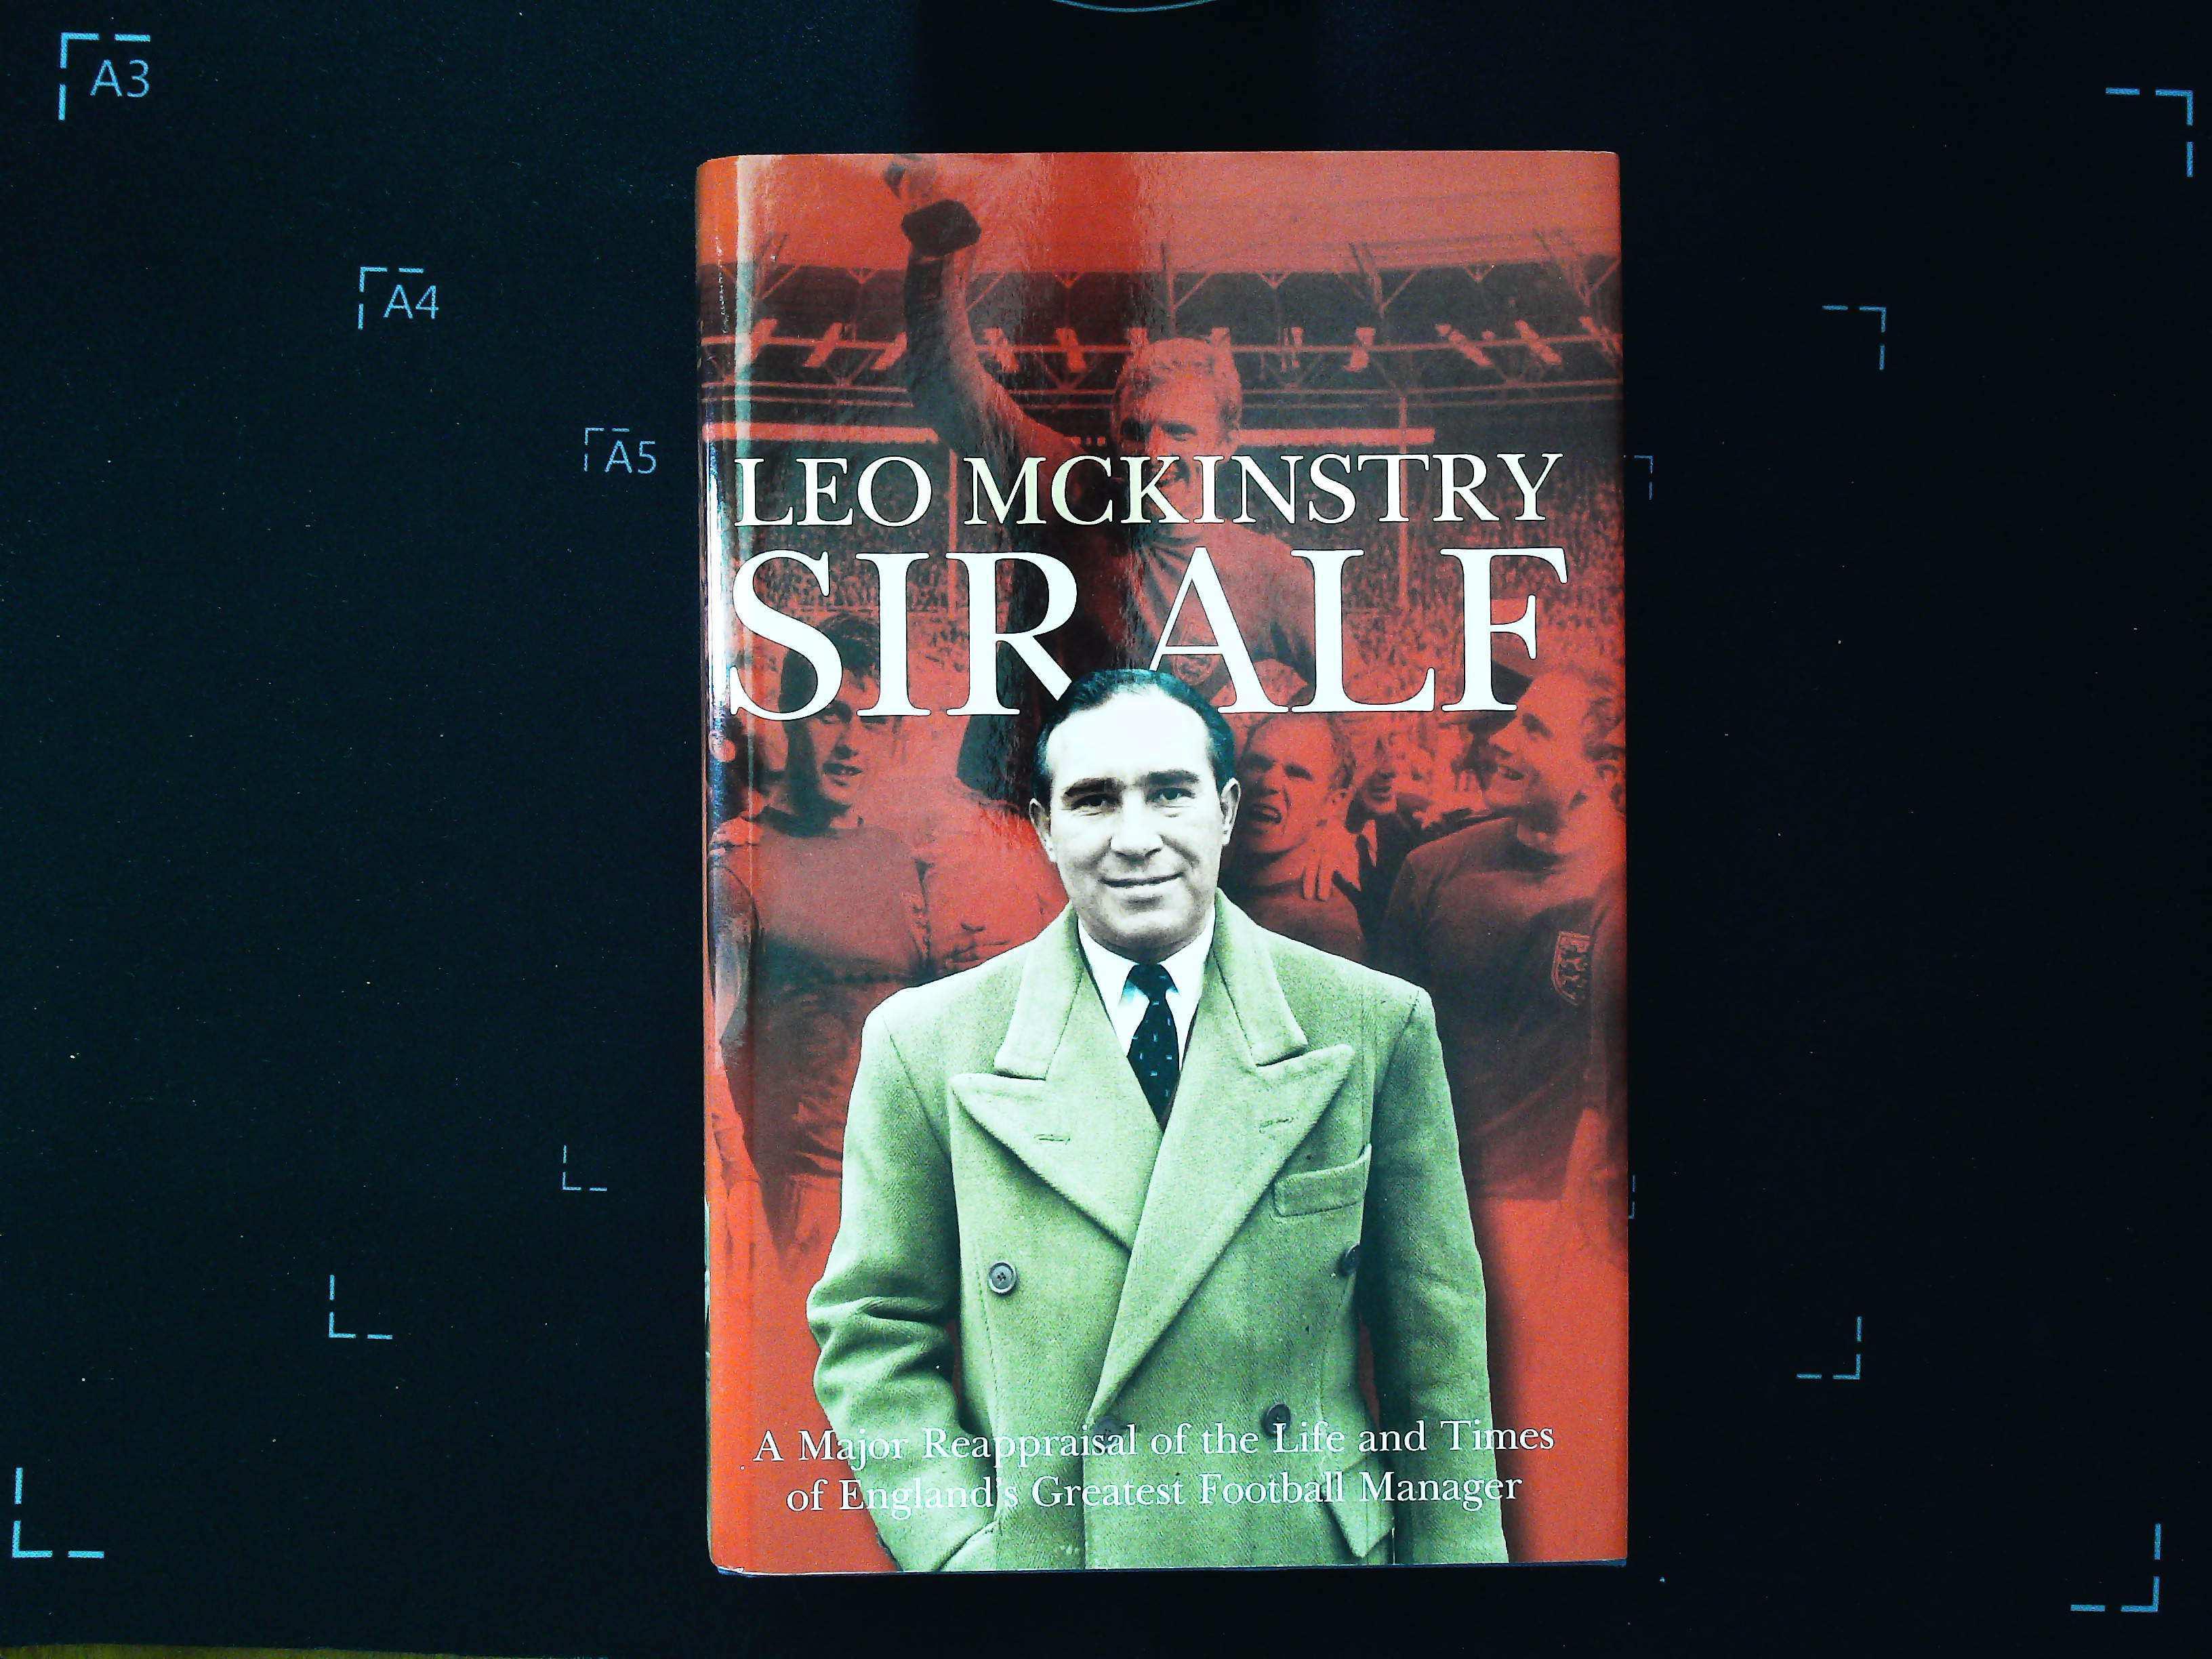 Sir Alf hardback book by Leo McKinstry. Published 2006 Harpersport. ISBN 0-00-719378-5. 528 pages.